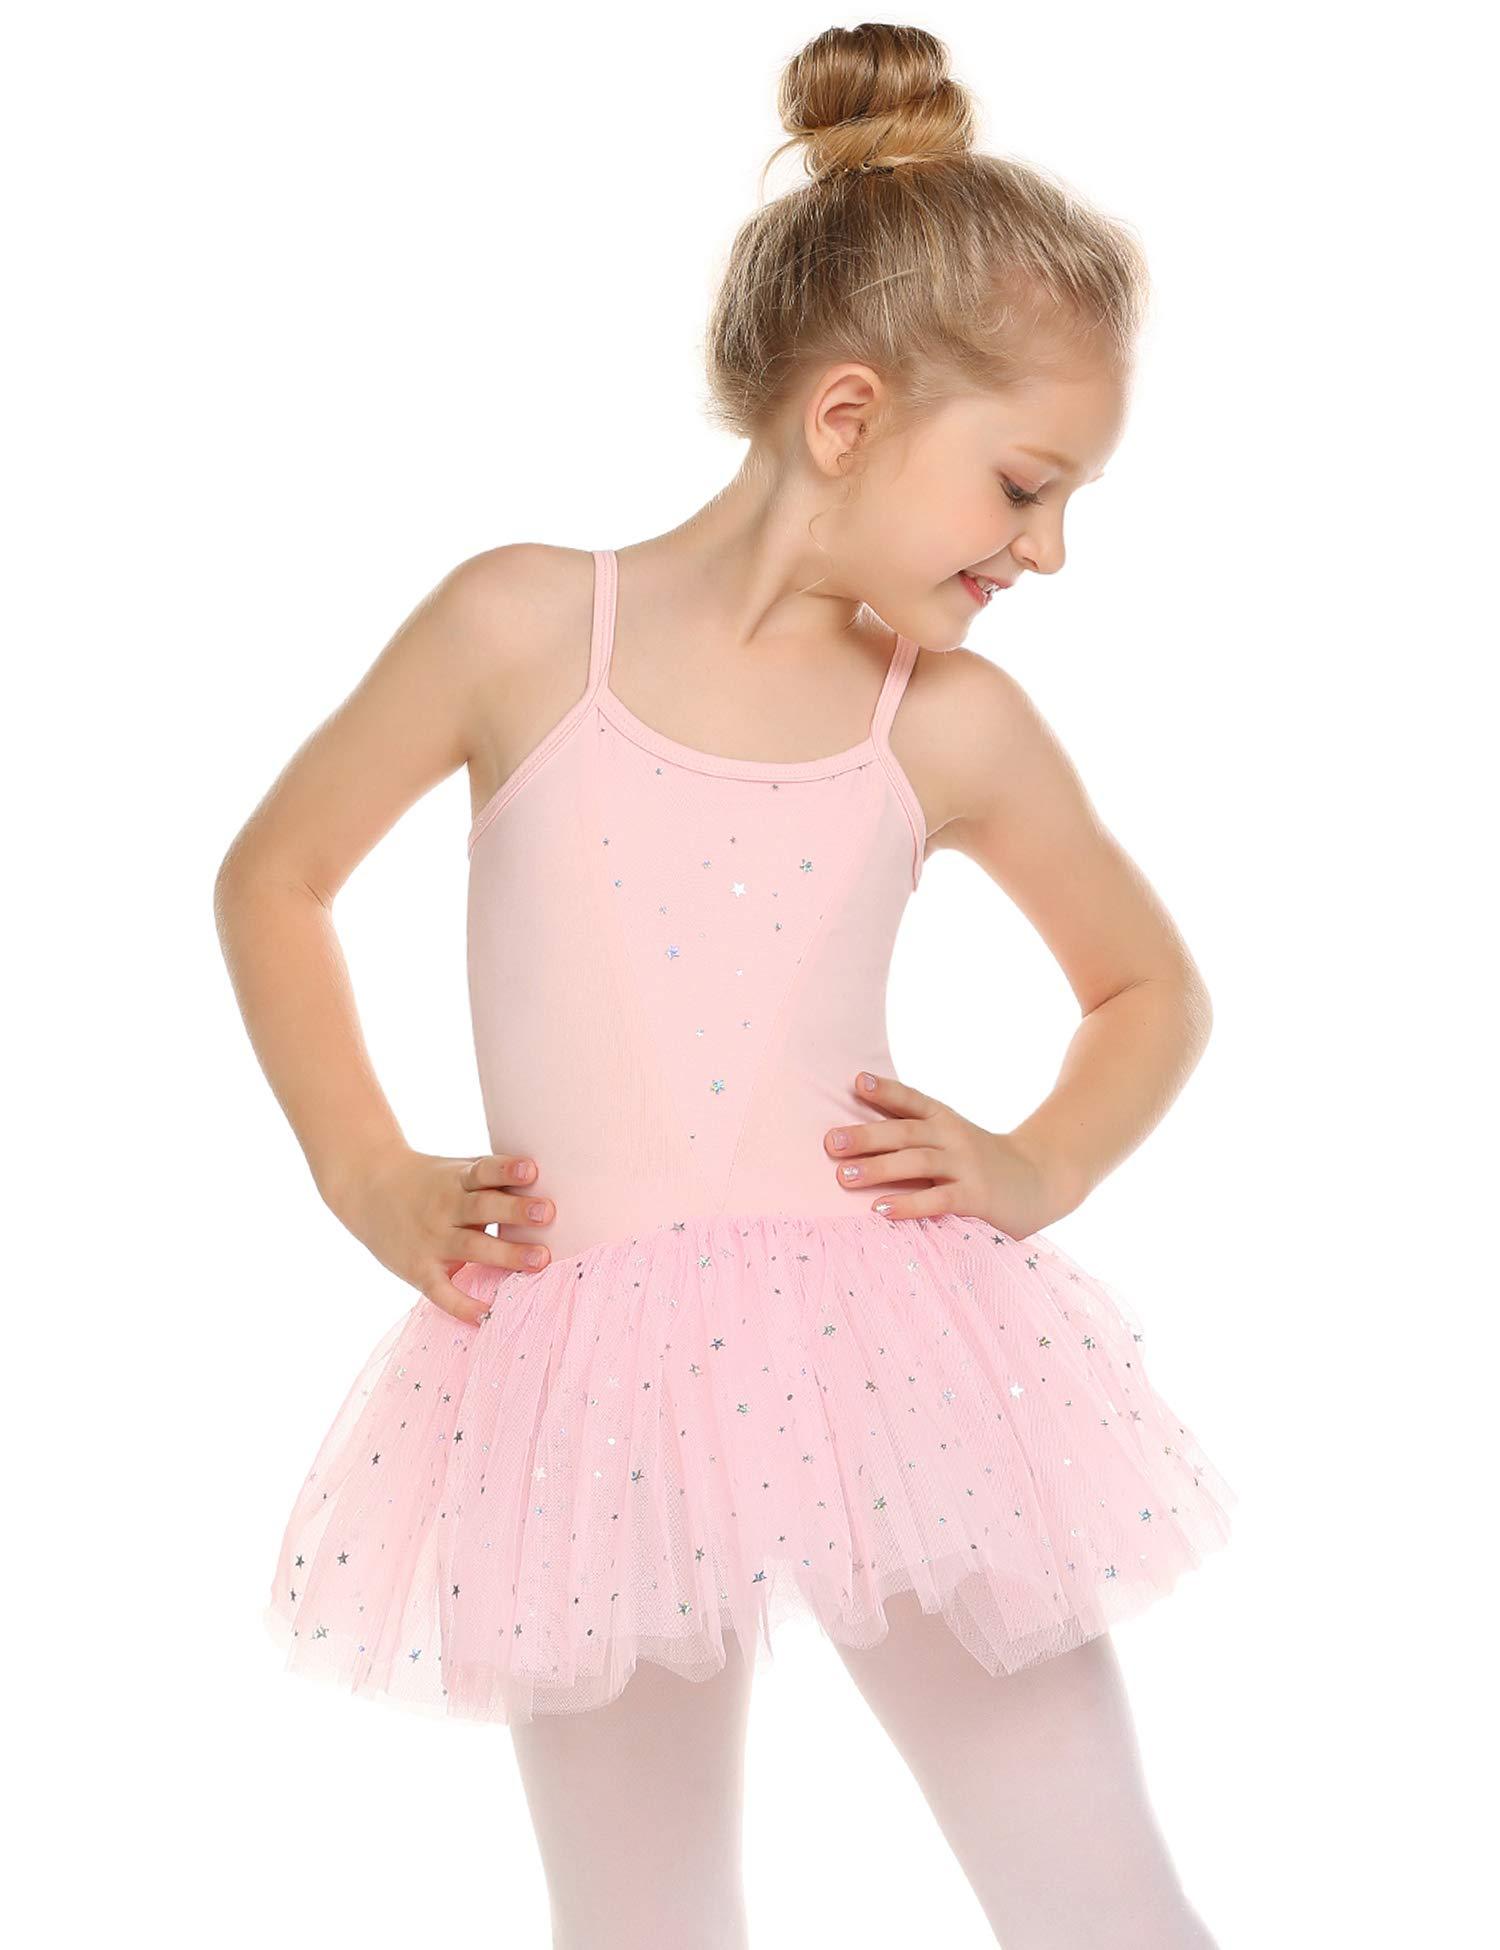 Zaclotre Girls Glitter Camisole Strap Tutu Ballet Leotard